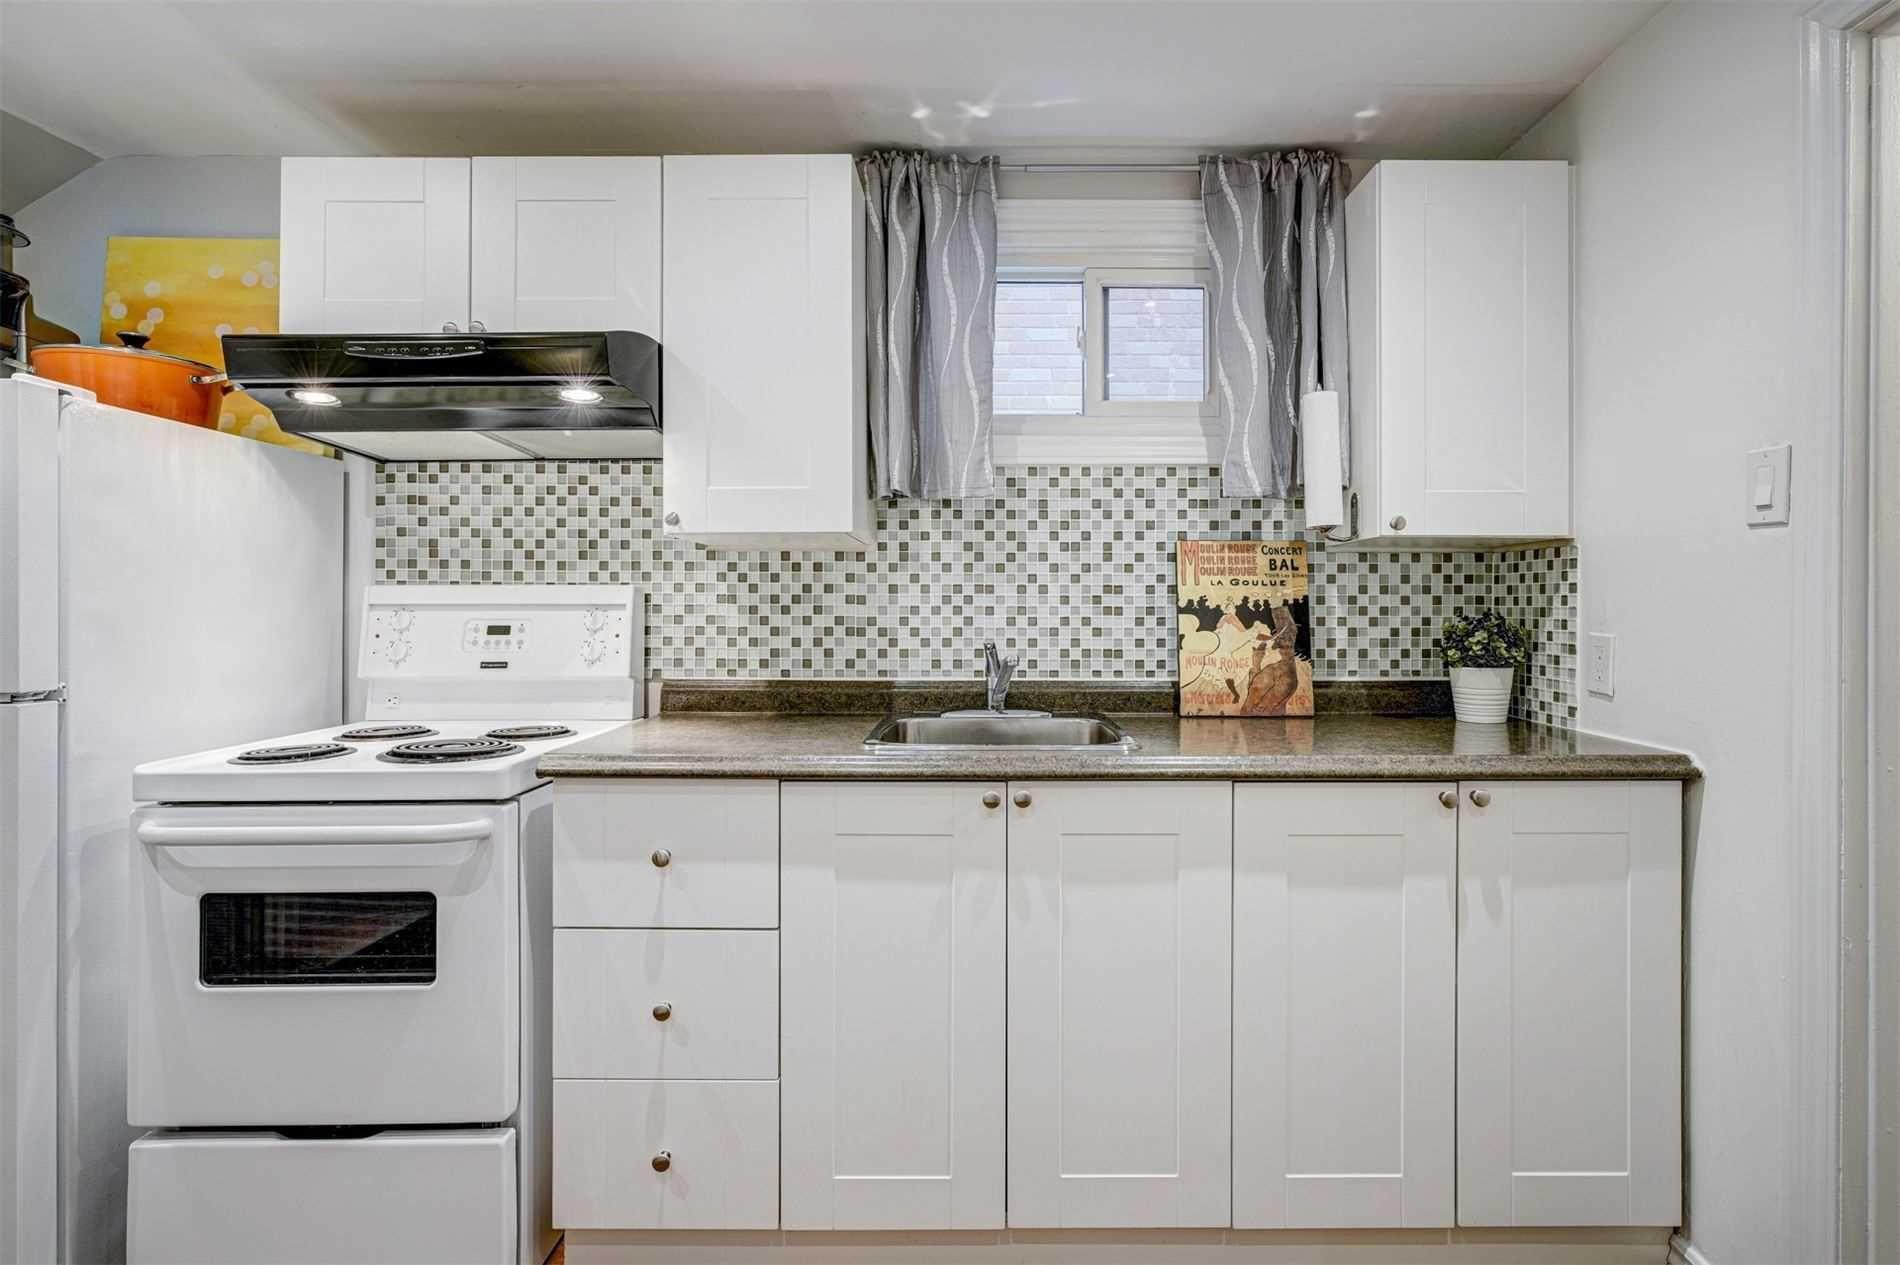 Photo 26: Photos: 92 Holborne Avenue in Toronto: Danforth Village-East York House (2-Storey) for sale (Toronto E03)  : MLS®# E5204452